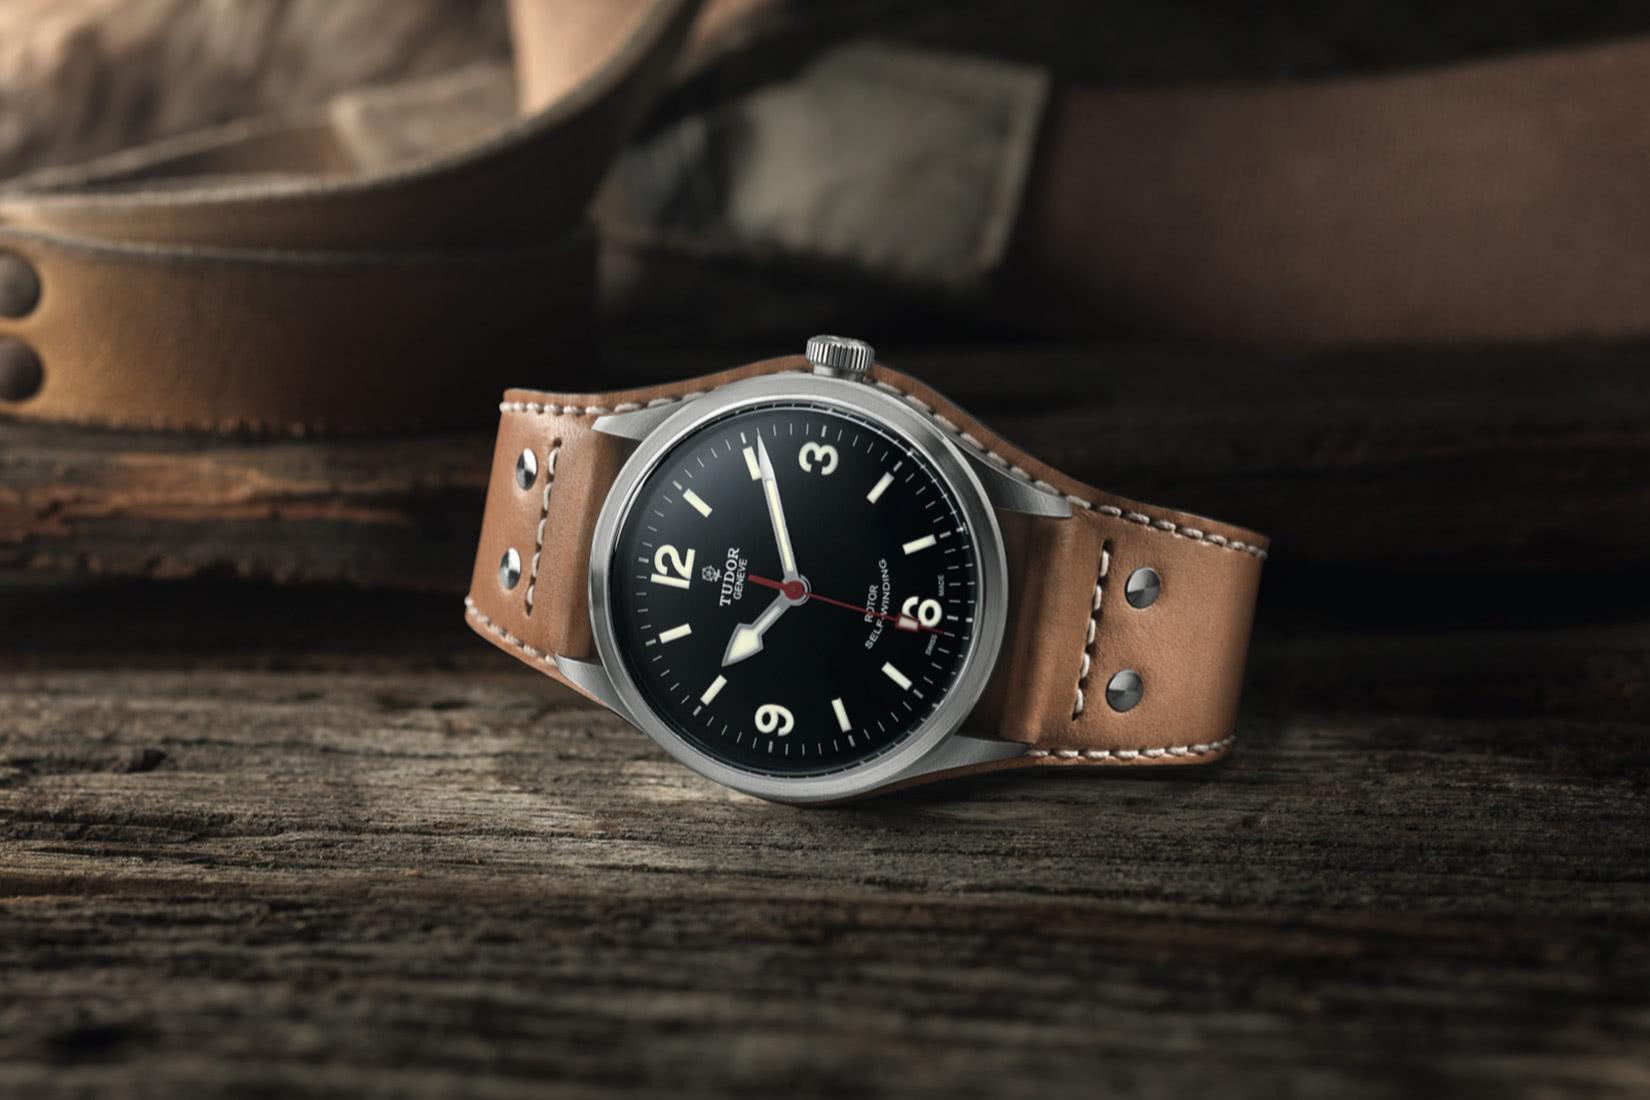 watch straps bracelets bund - Luxe Digital